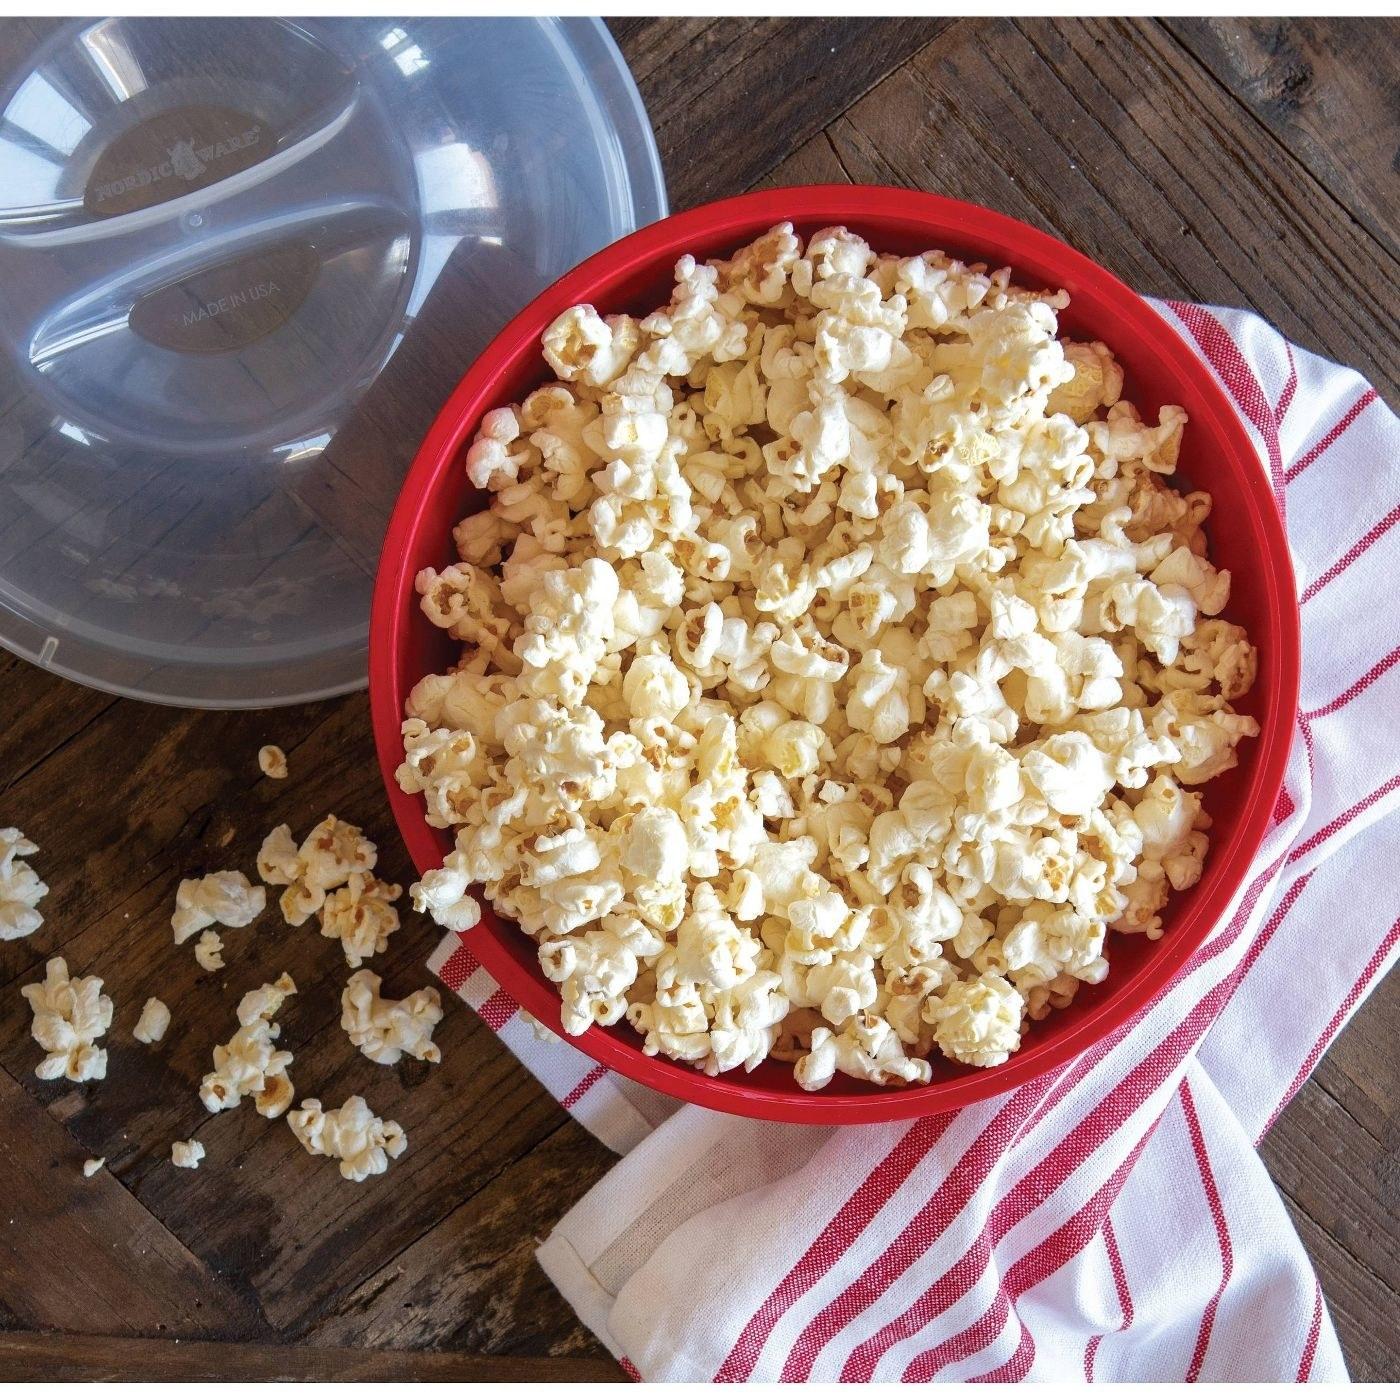 a bowl of freshly popped popcorn